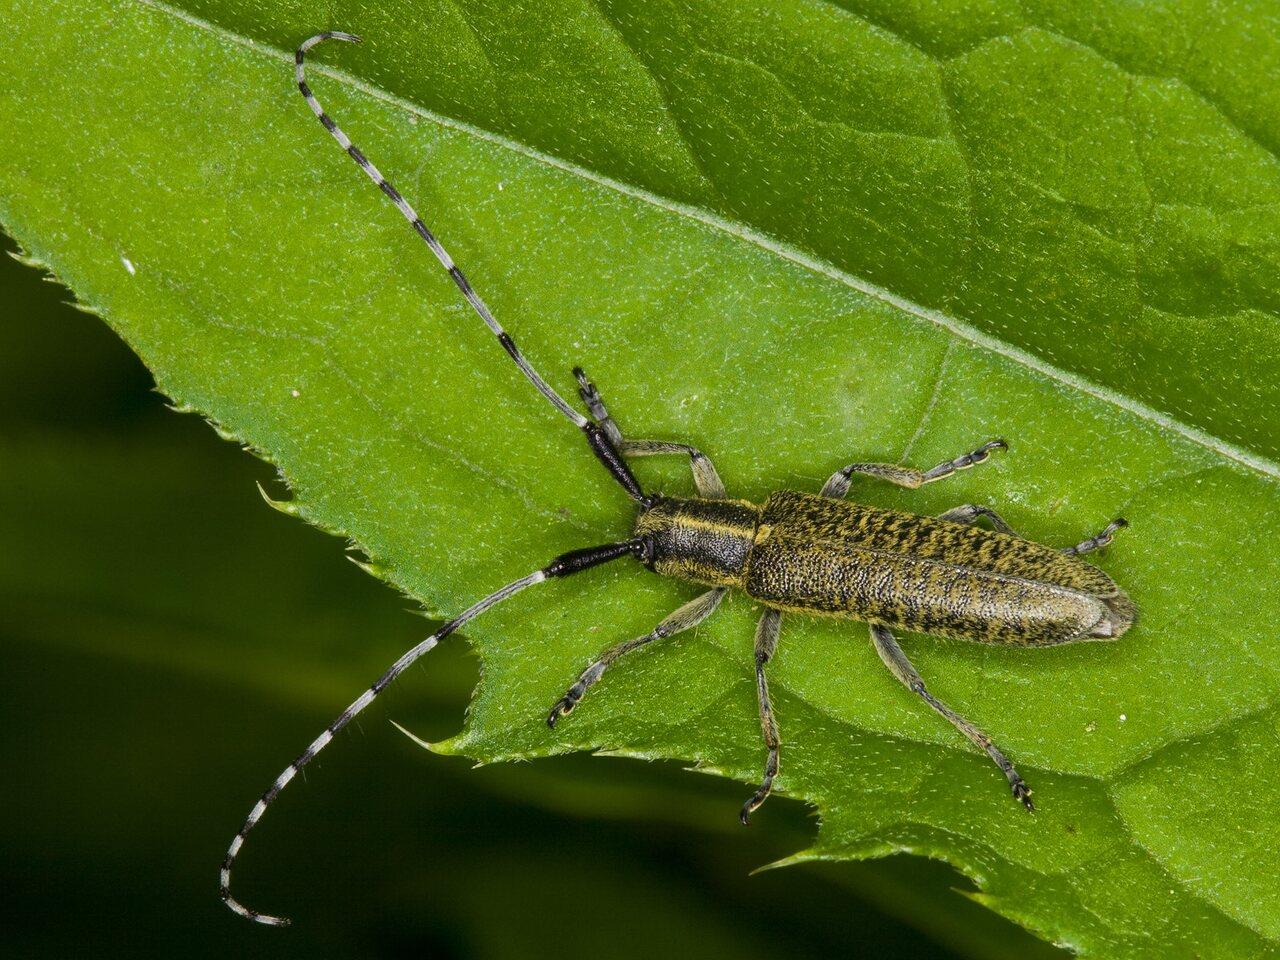 Agapanthia-villosoviridescens-3301.jpg